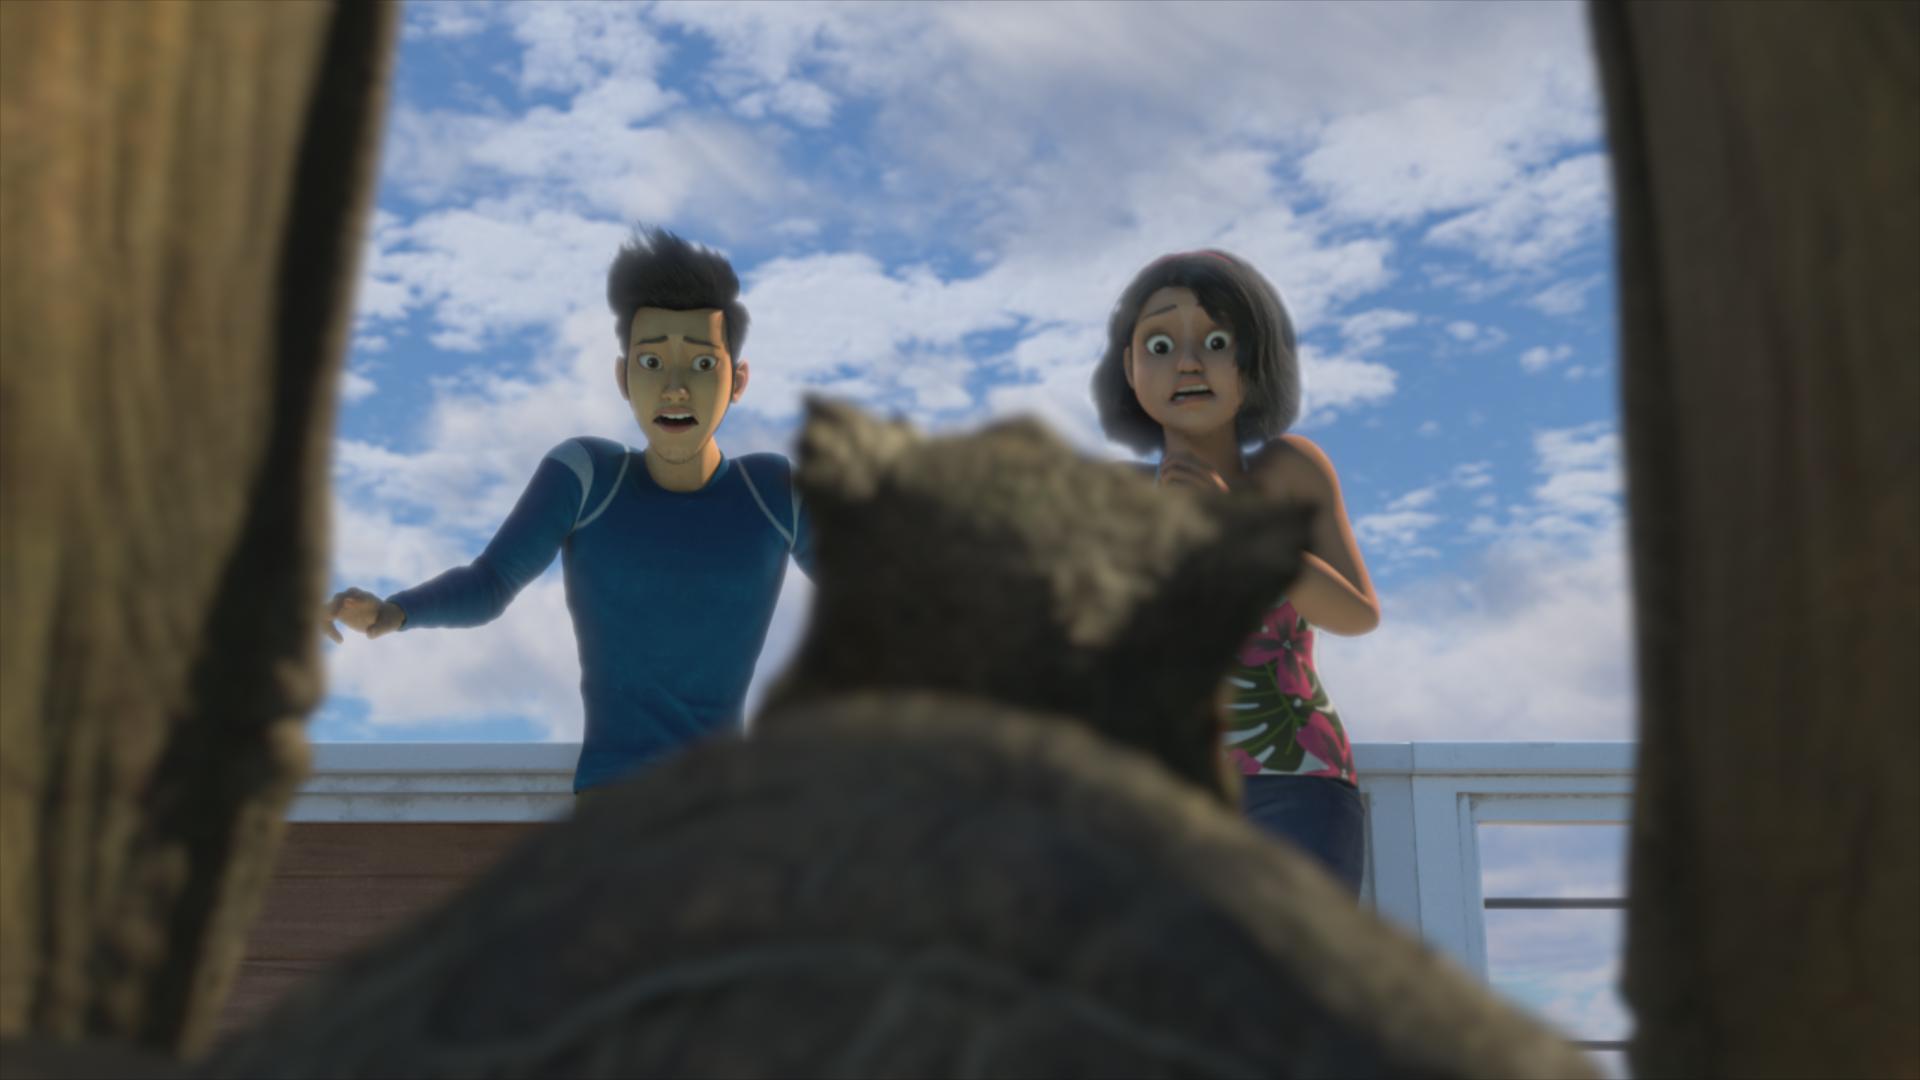 'A New Threat Has Evolved' – Camp Cretaceous Season 3 Trailer Drops!